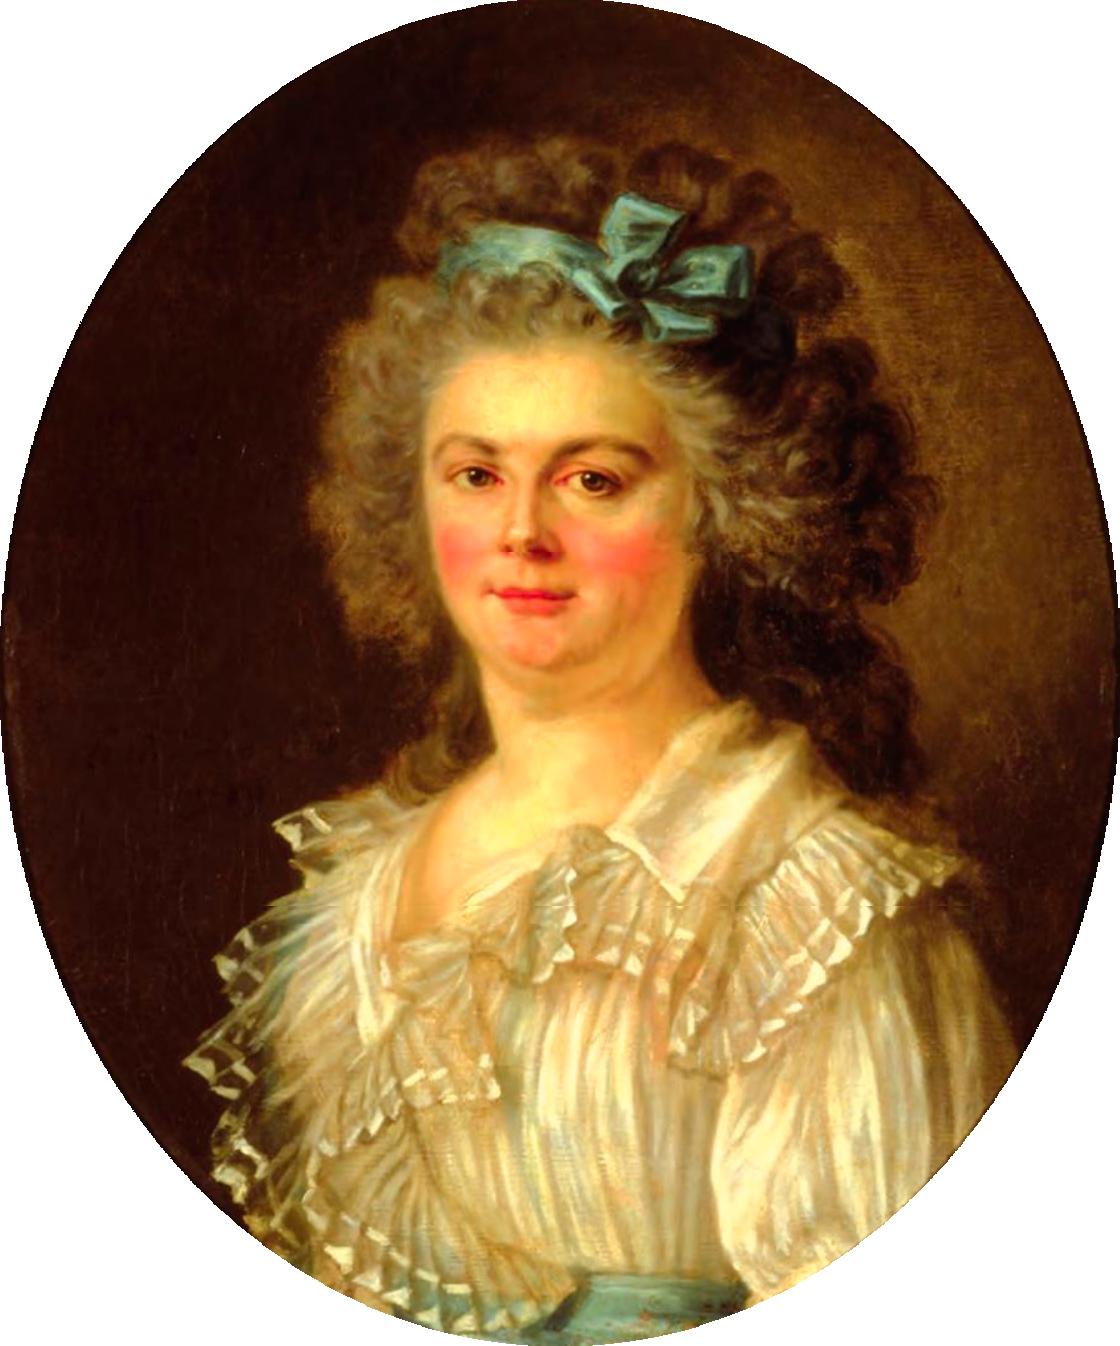 Fichier:Rose Bertin Van Loo.png — Wikipédia